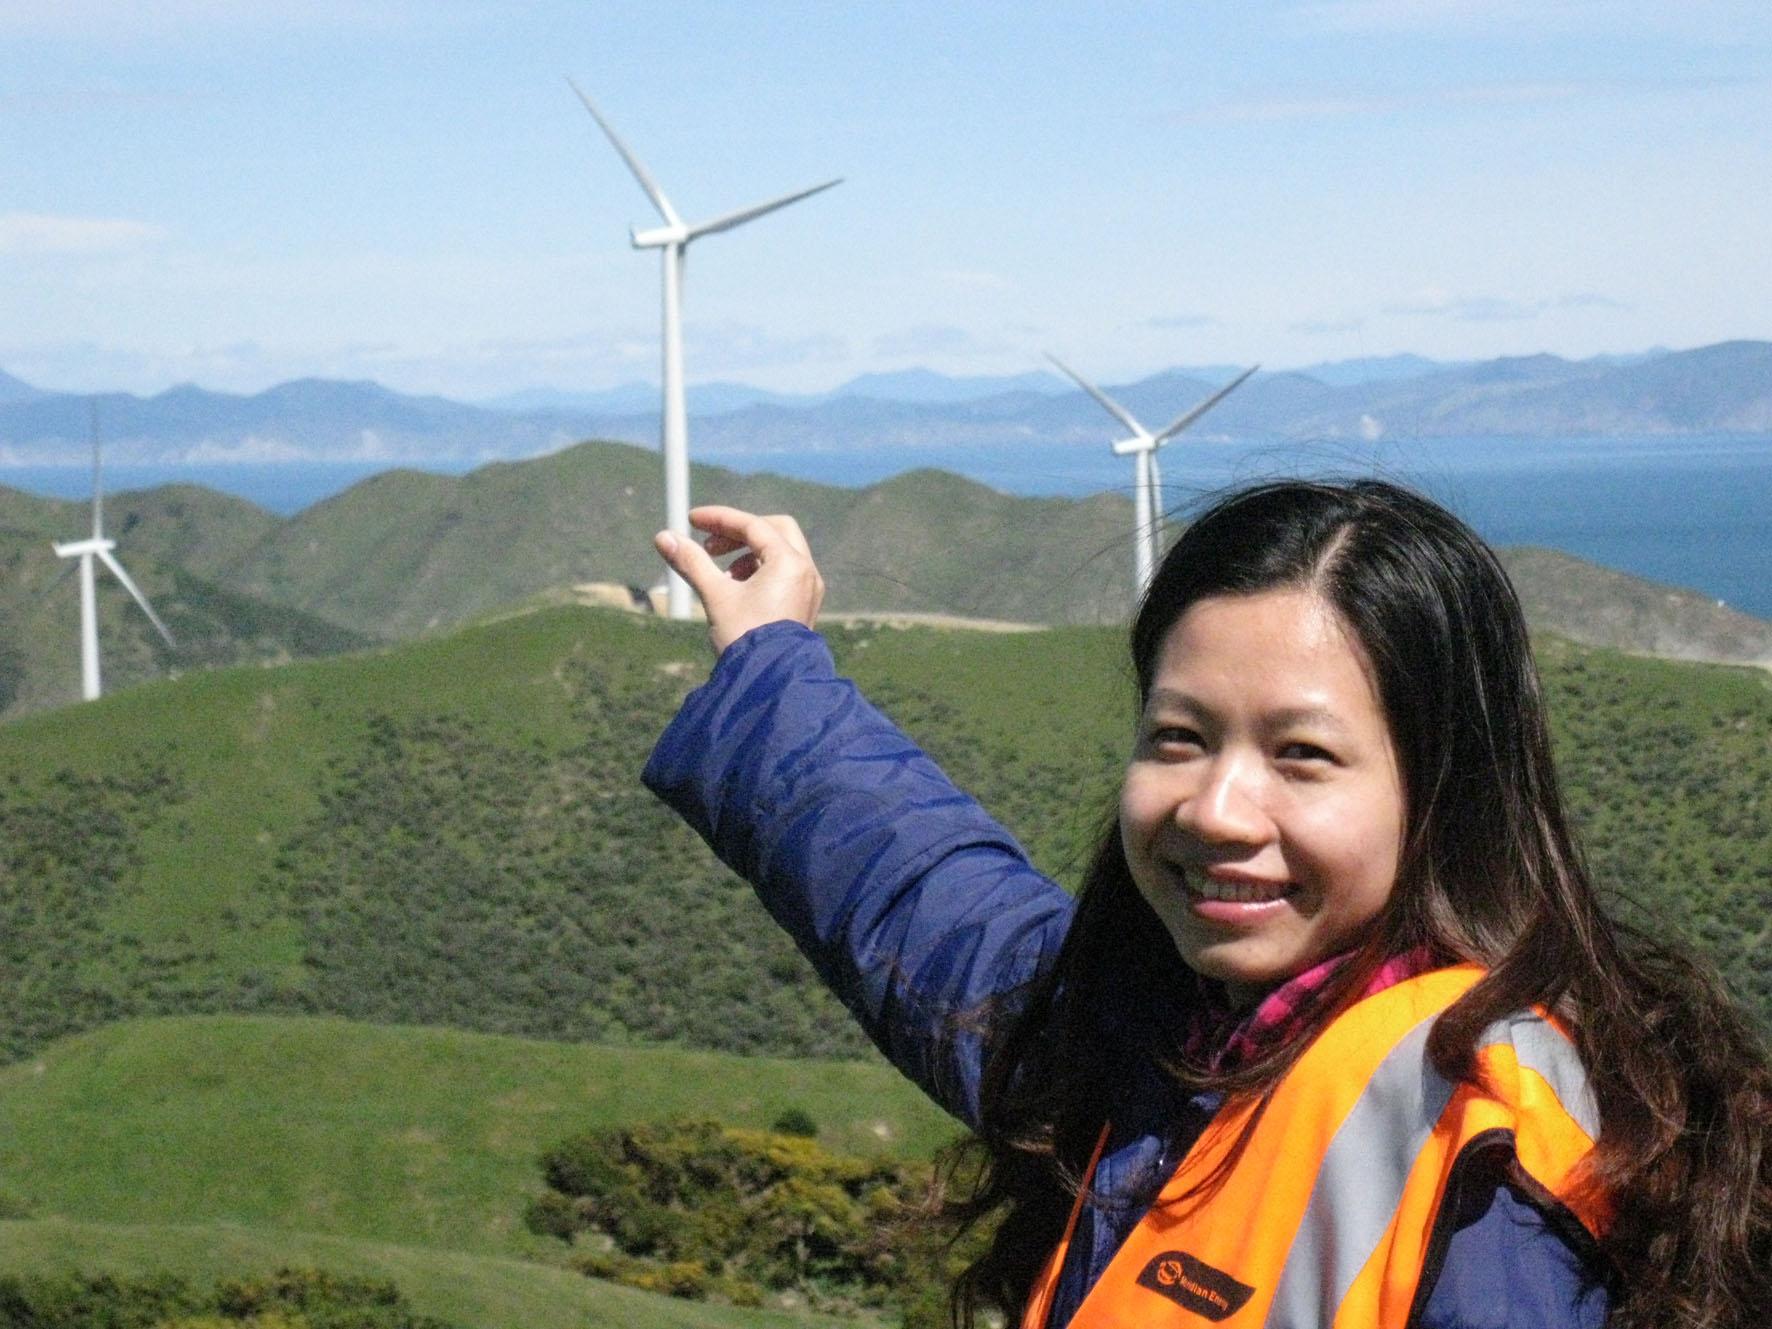 Provincia de Ninh Thuan por convertirse en centro de energías renovables de Vietnam